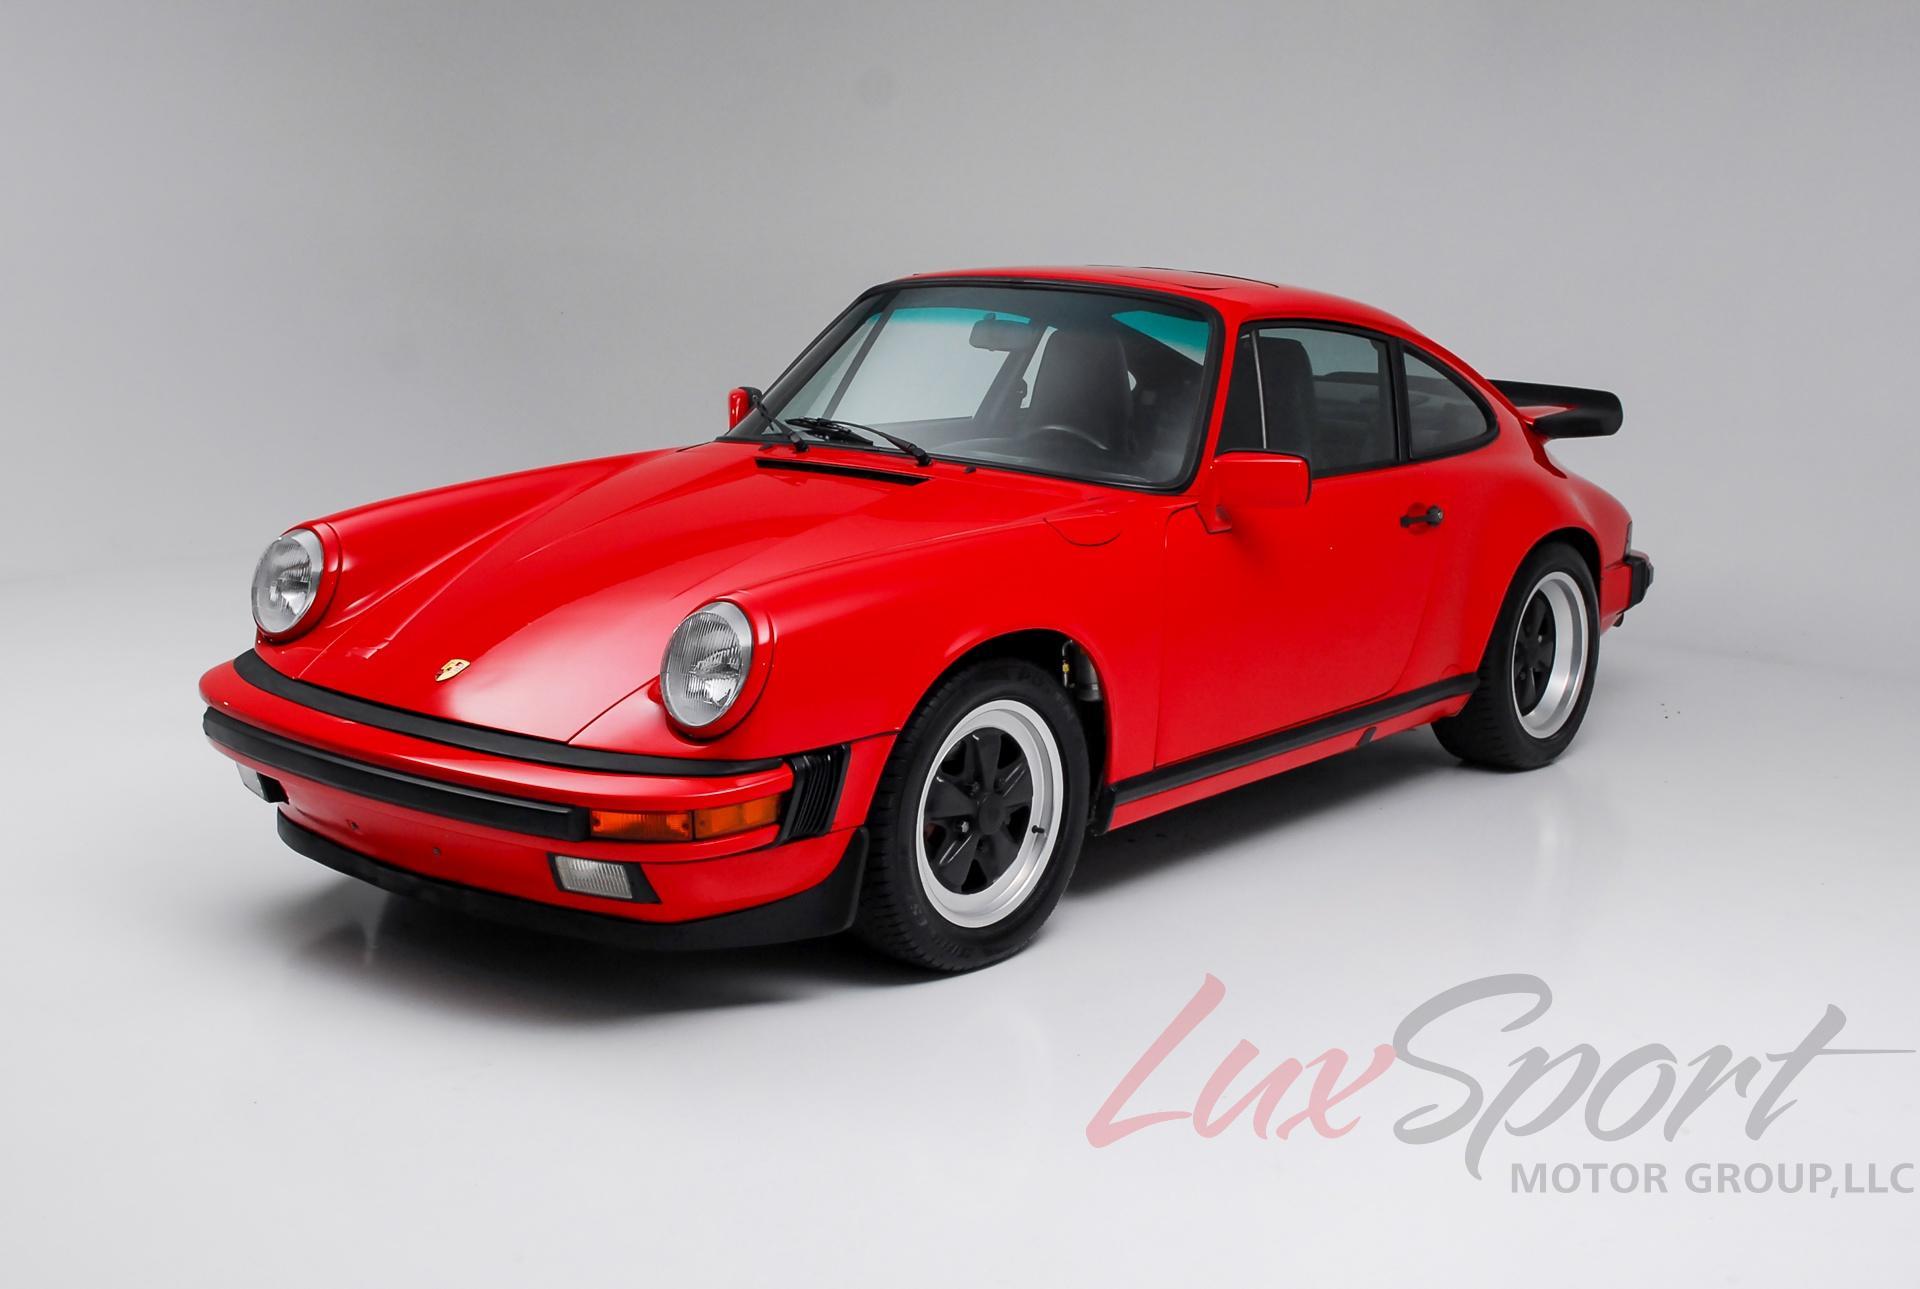 1989 porsche 911 carrera coupe carrera stock 1989109 for sale near new hyde park ny ny. Black Bedroom Furniture Sets. Home Design Ideas